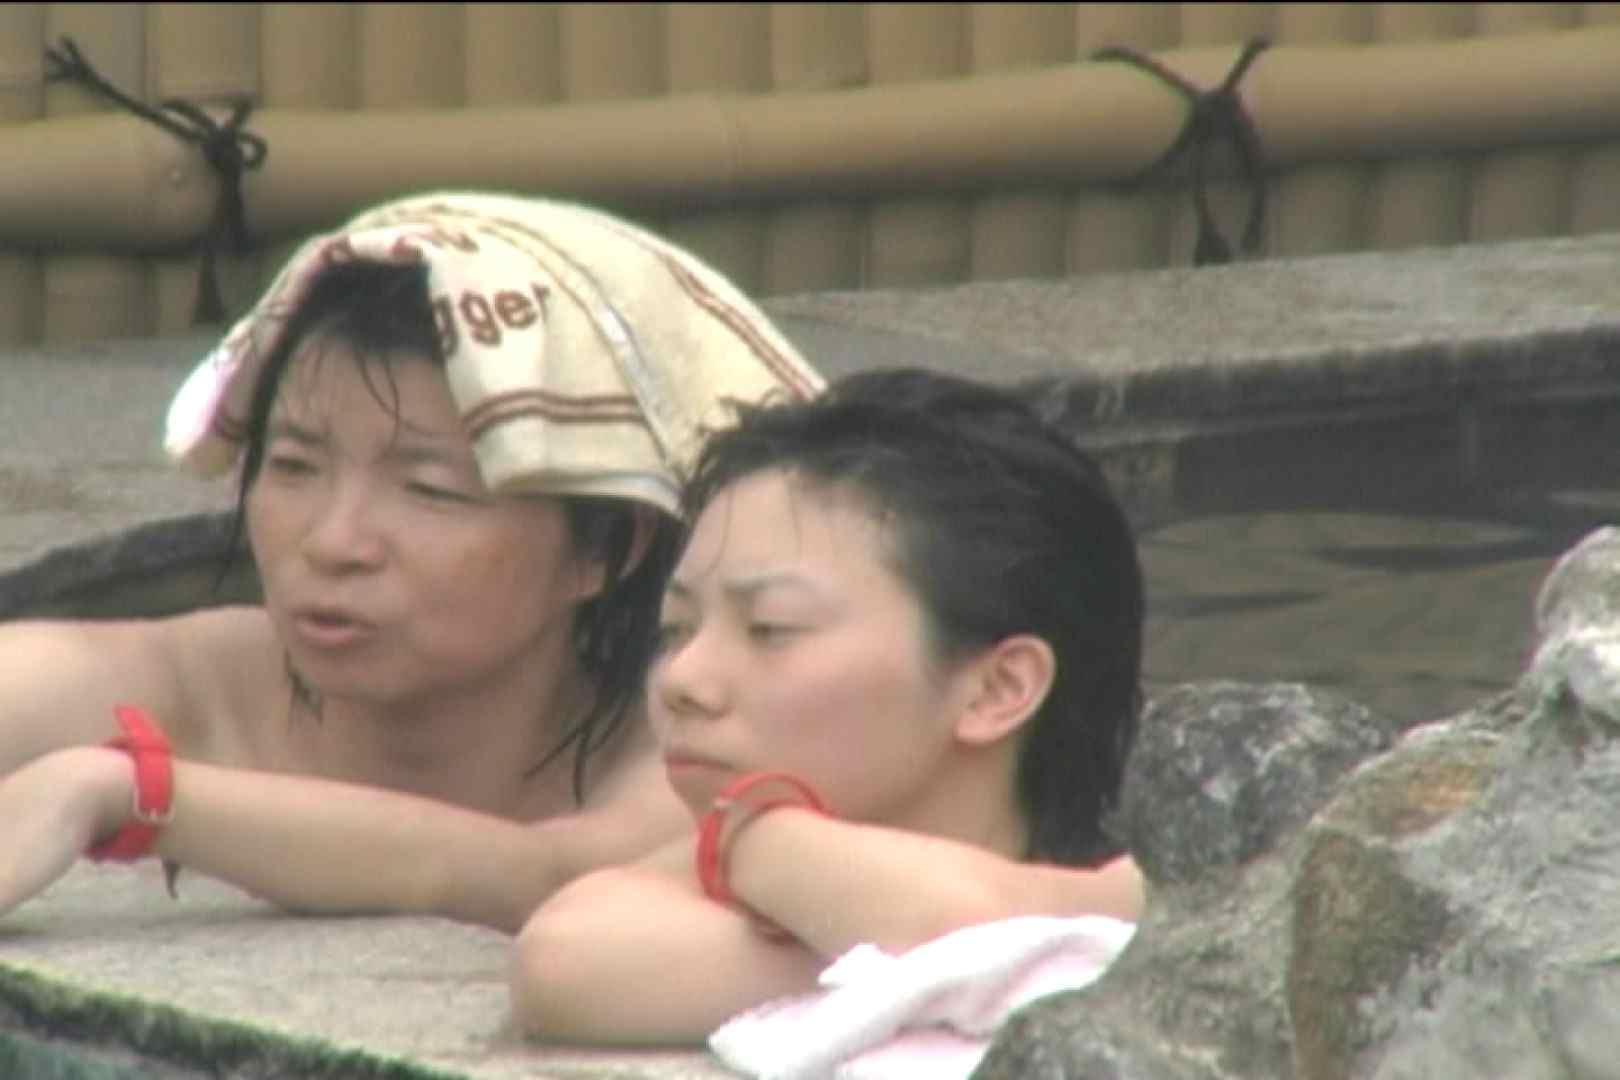 Aquaな露天風呂Vol.122 露天 おめこ無修正動画無料 107pic 3